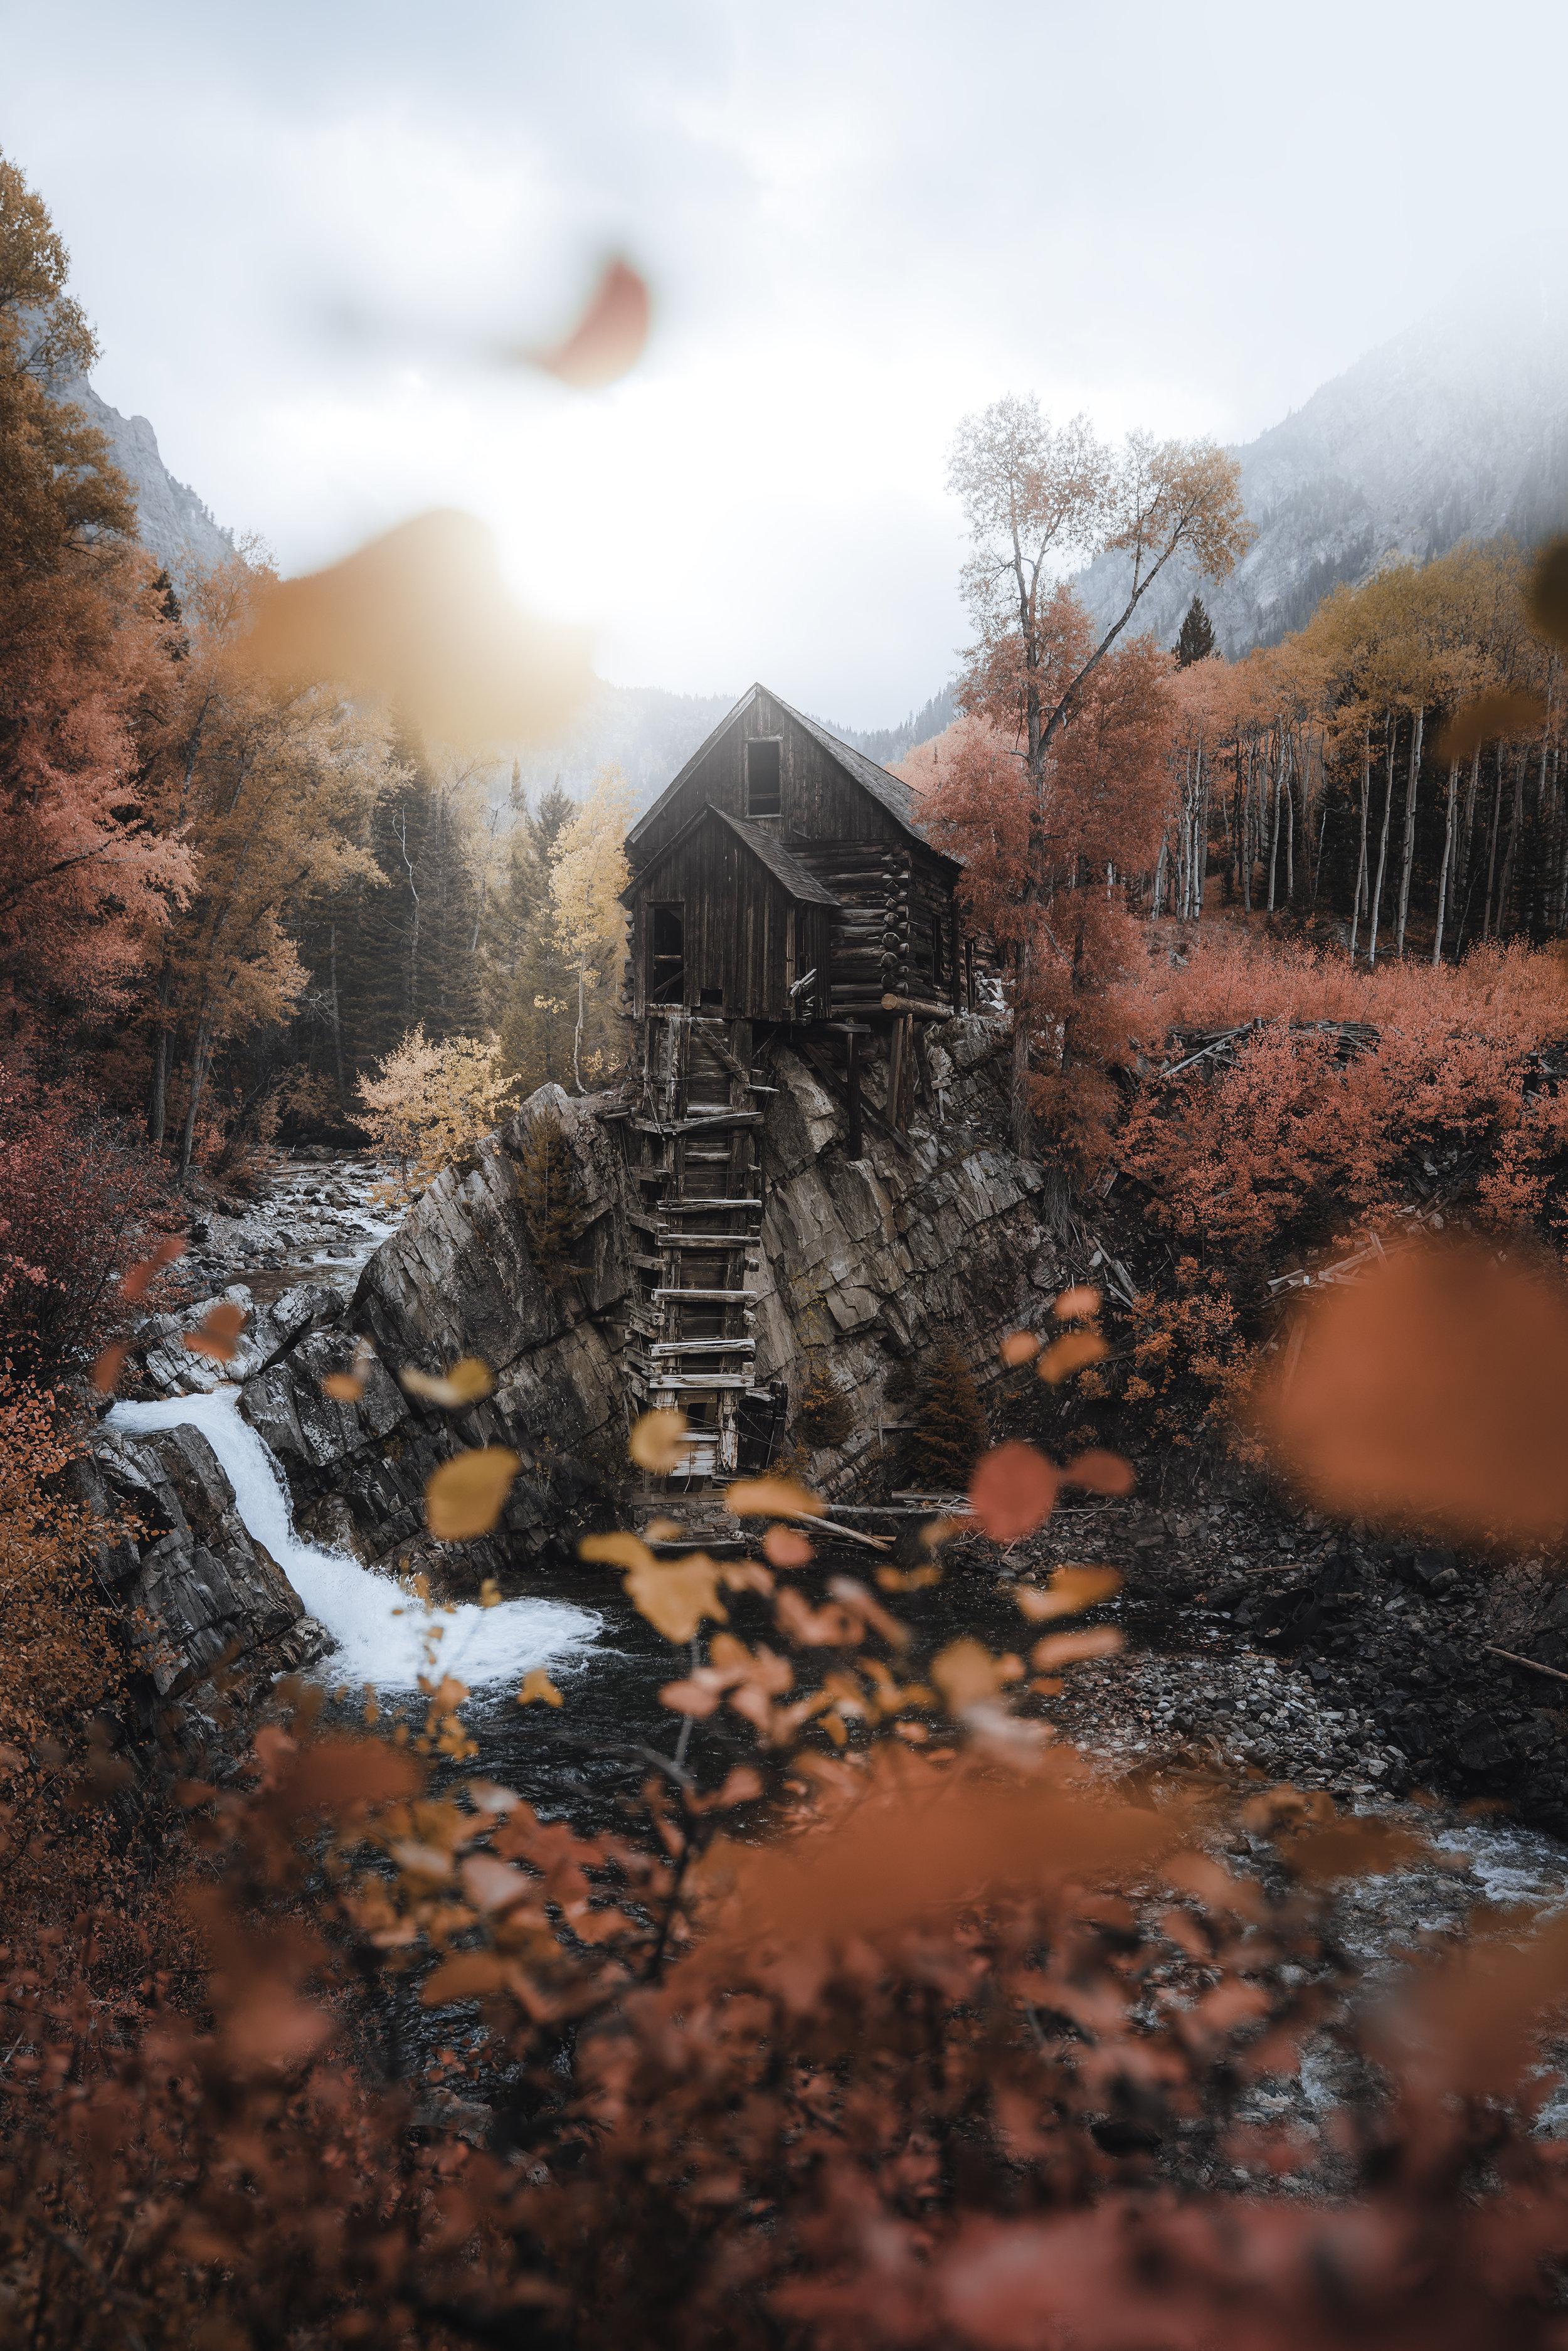 _DSC4905-Edit-1 - Magical Crystal Mill.jpg